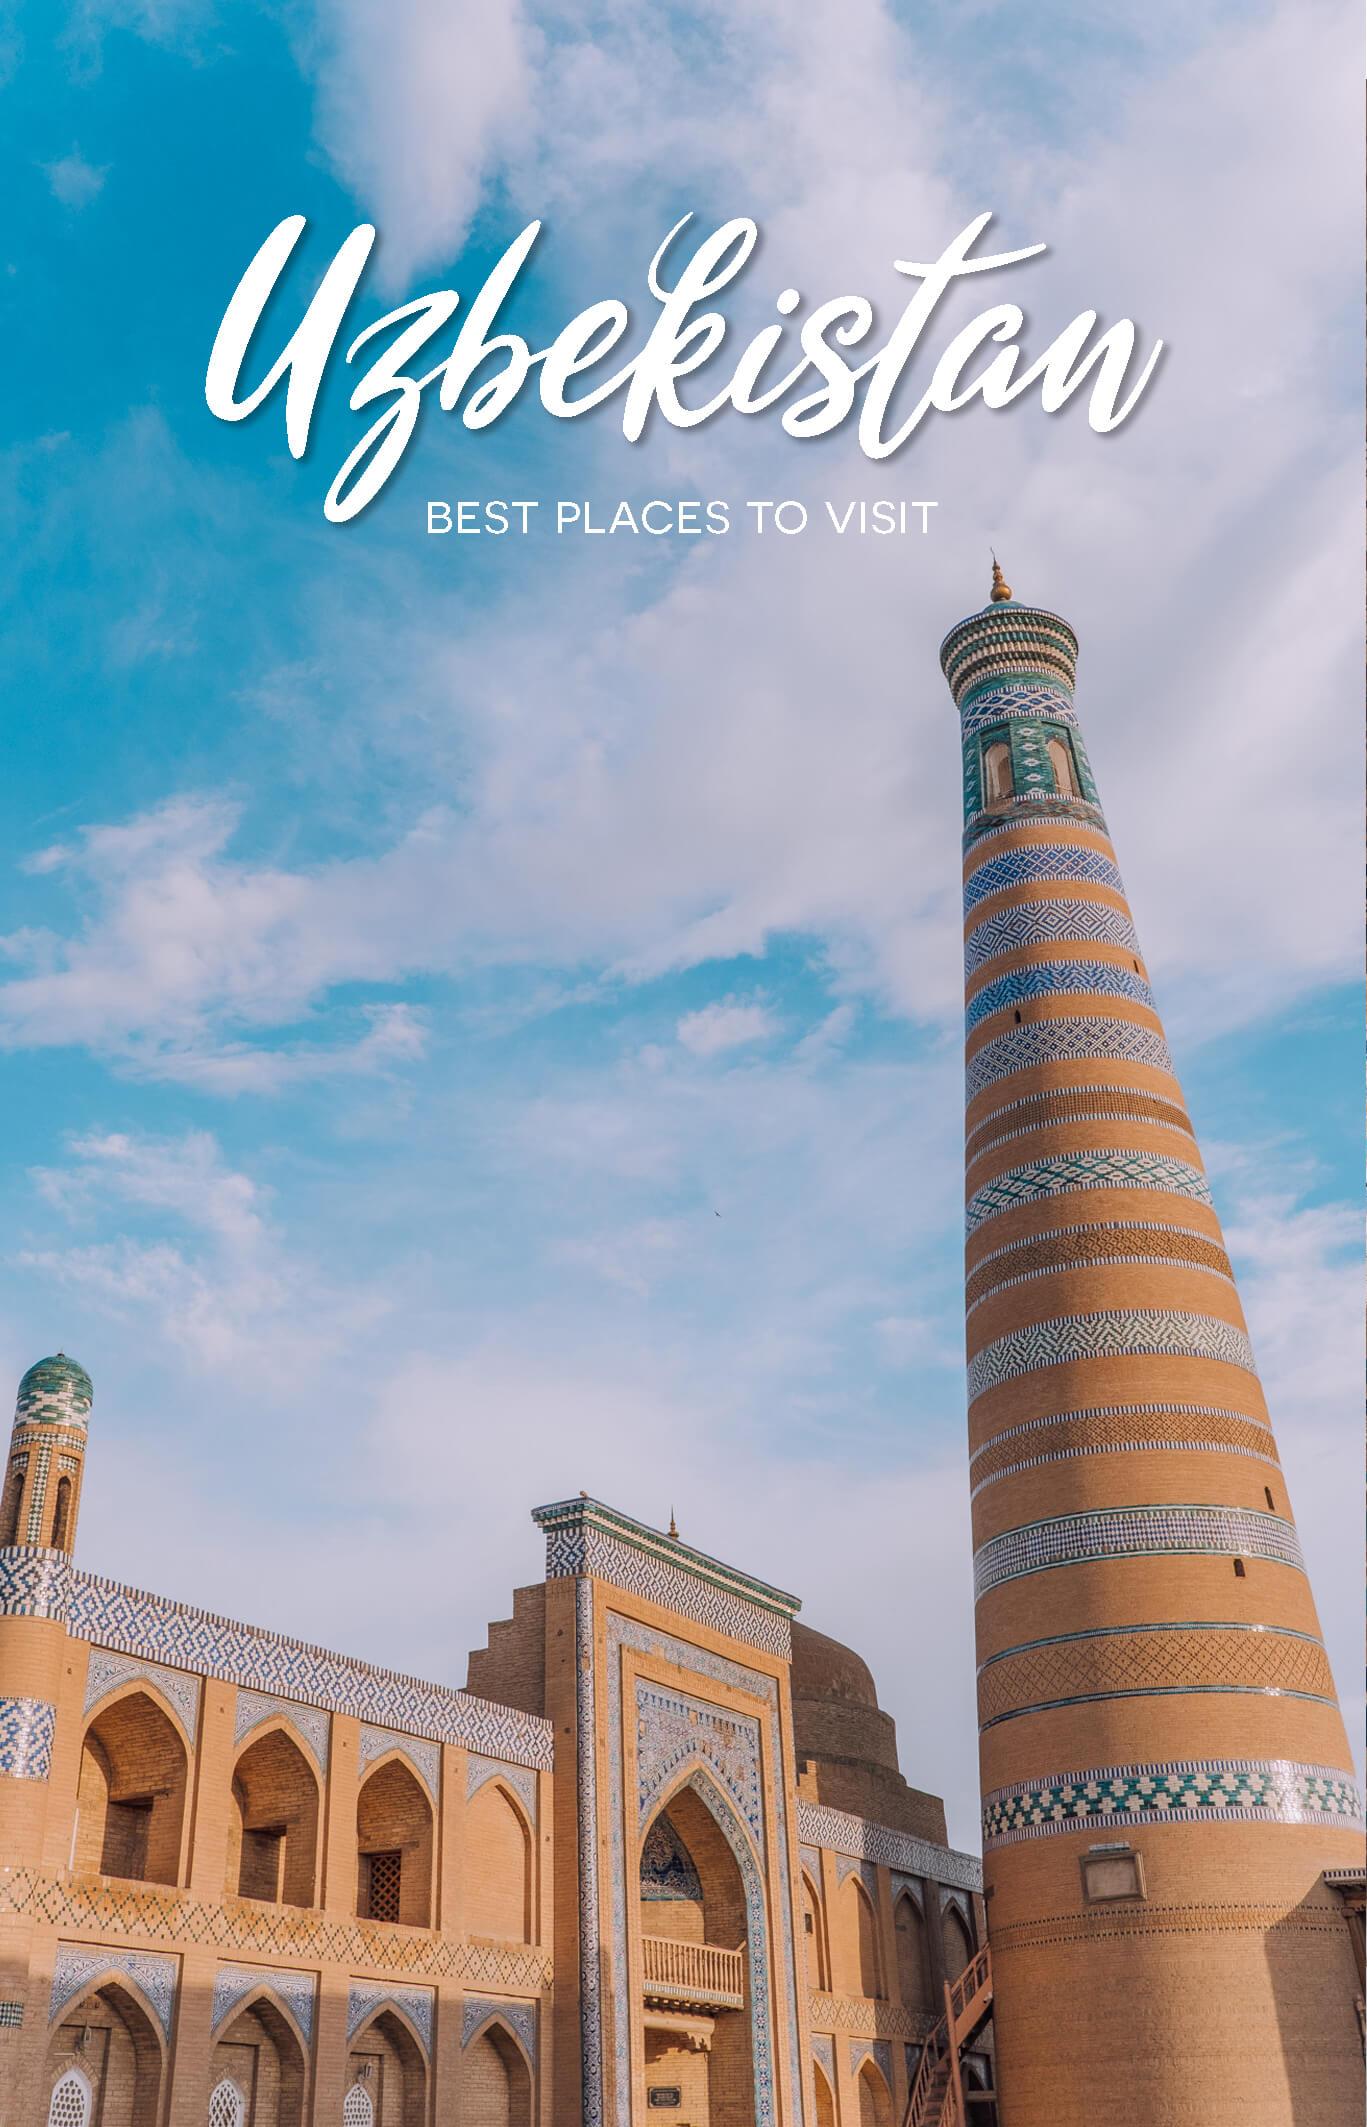 BestPlacesToVisit-Uzbekistan.jpg